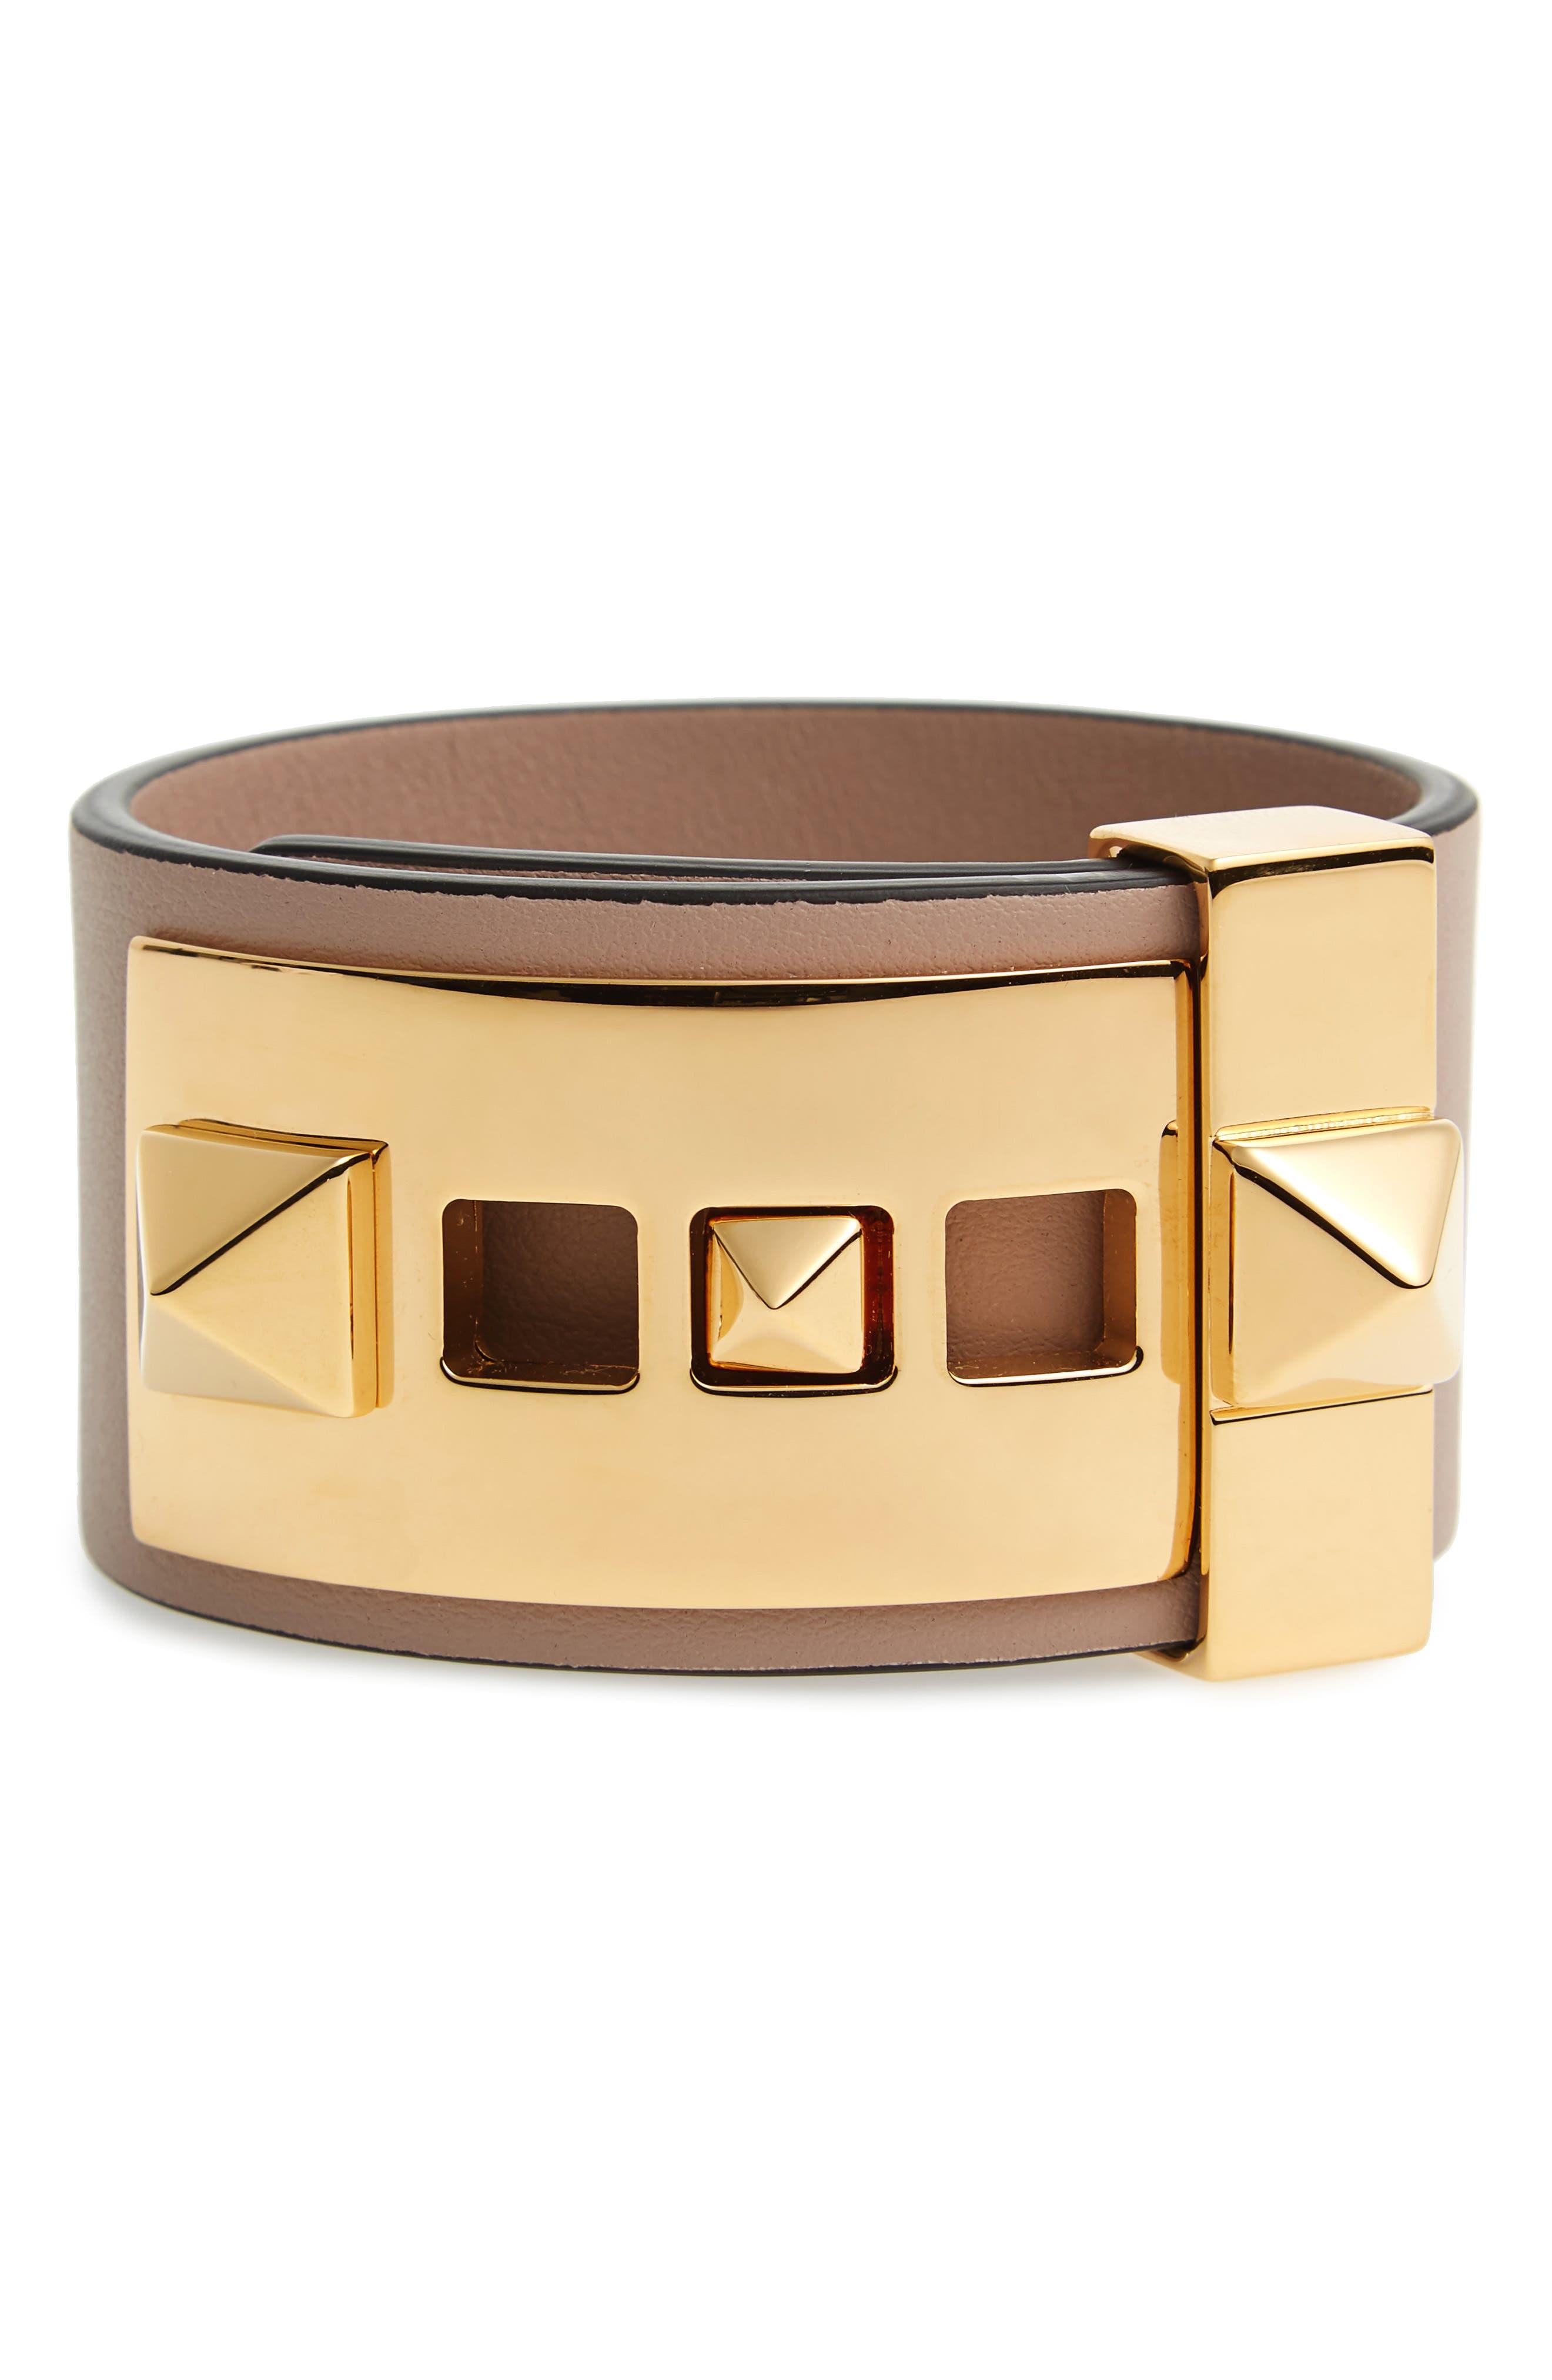 VALENTINO GARAVANI Rockstud Calfskin Leather Bracelet